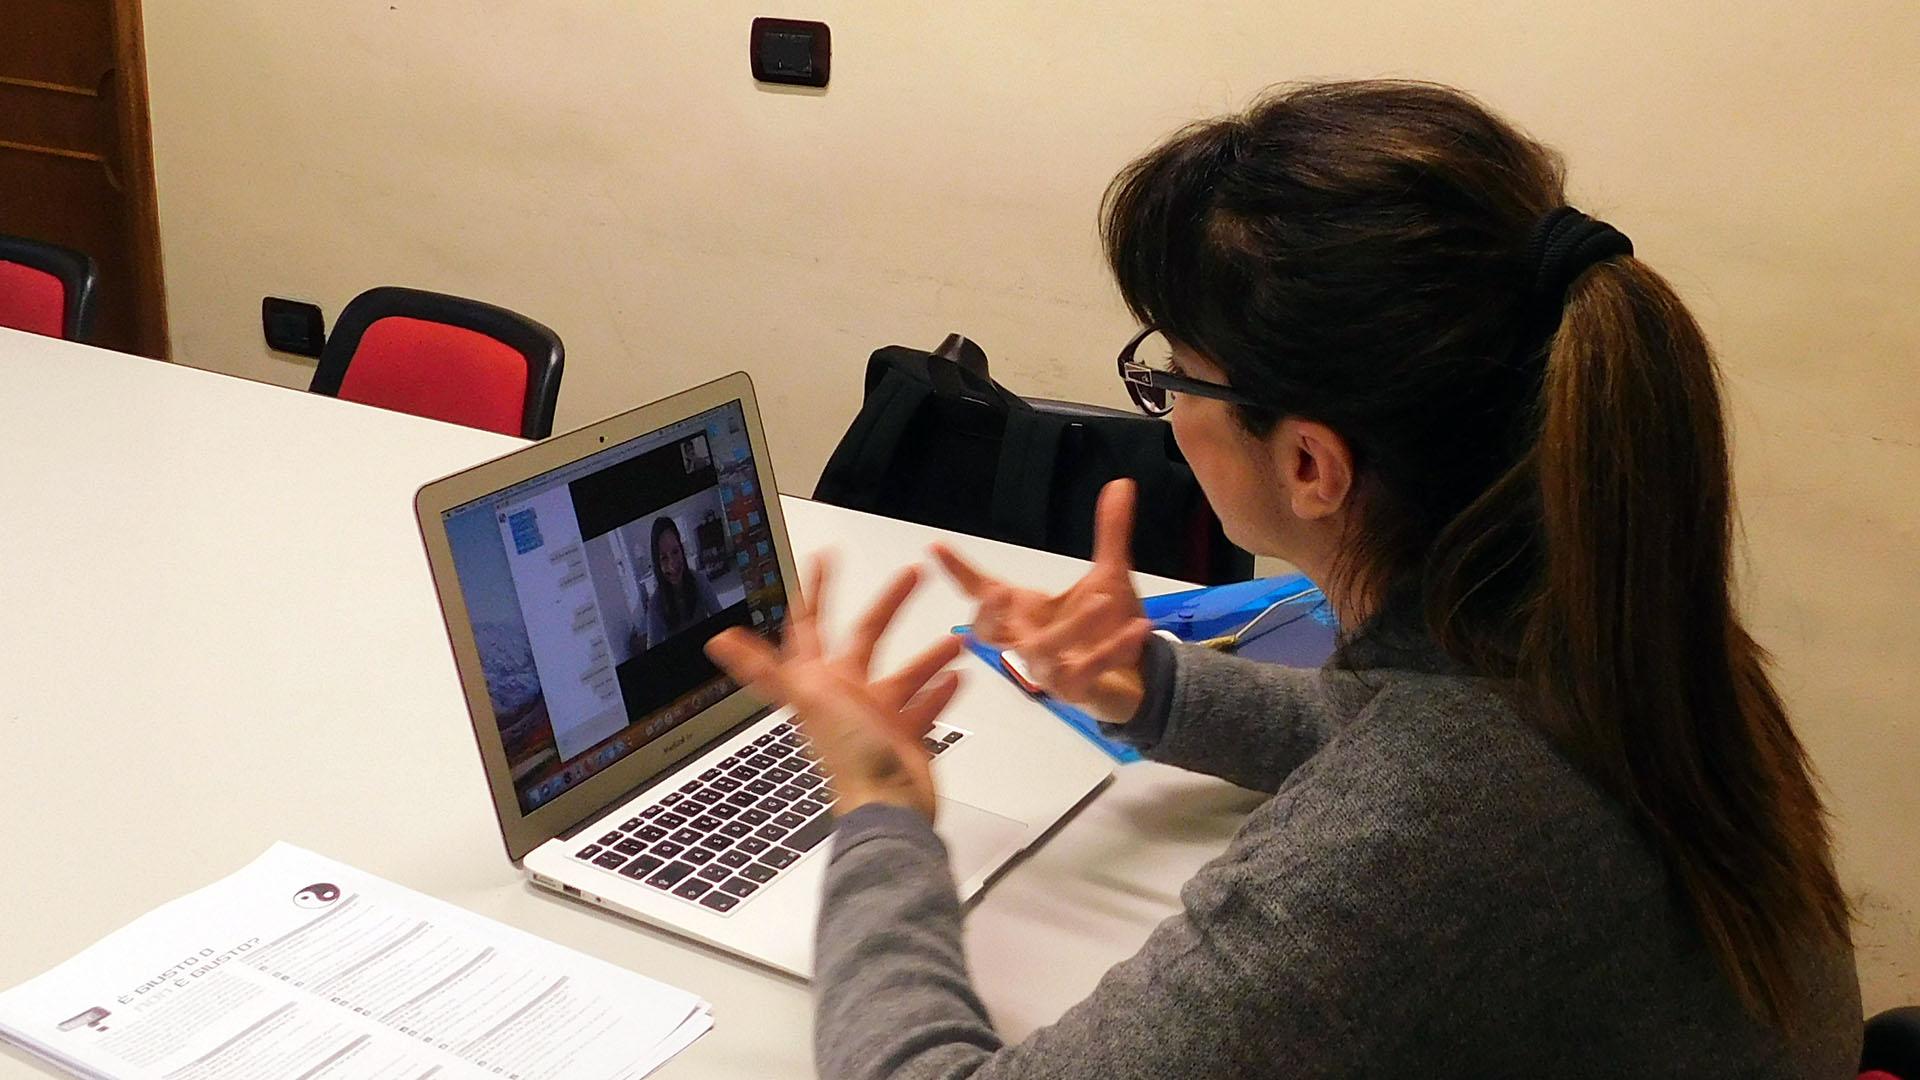 Corso di lingua online a Firenze